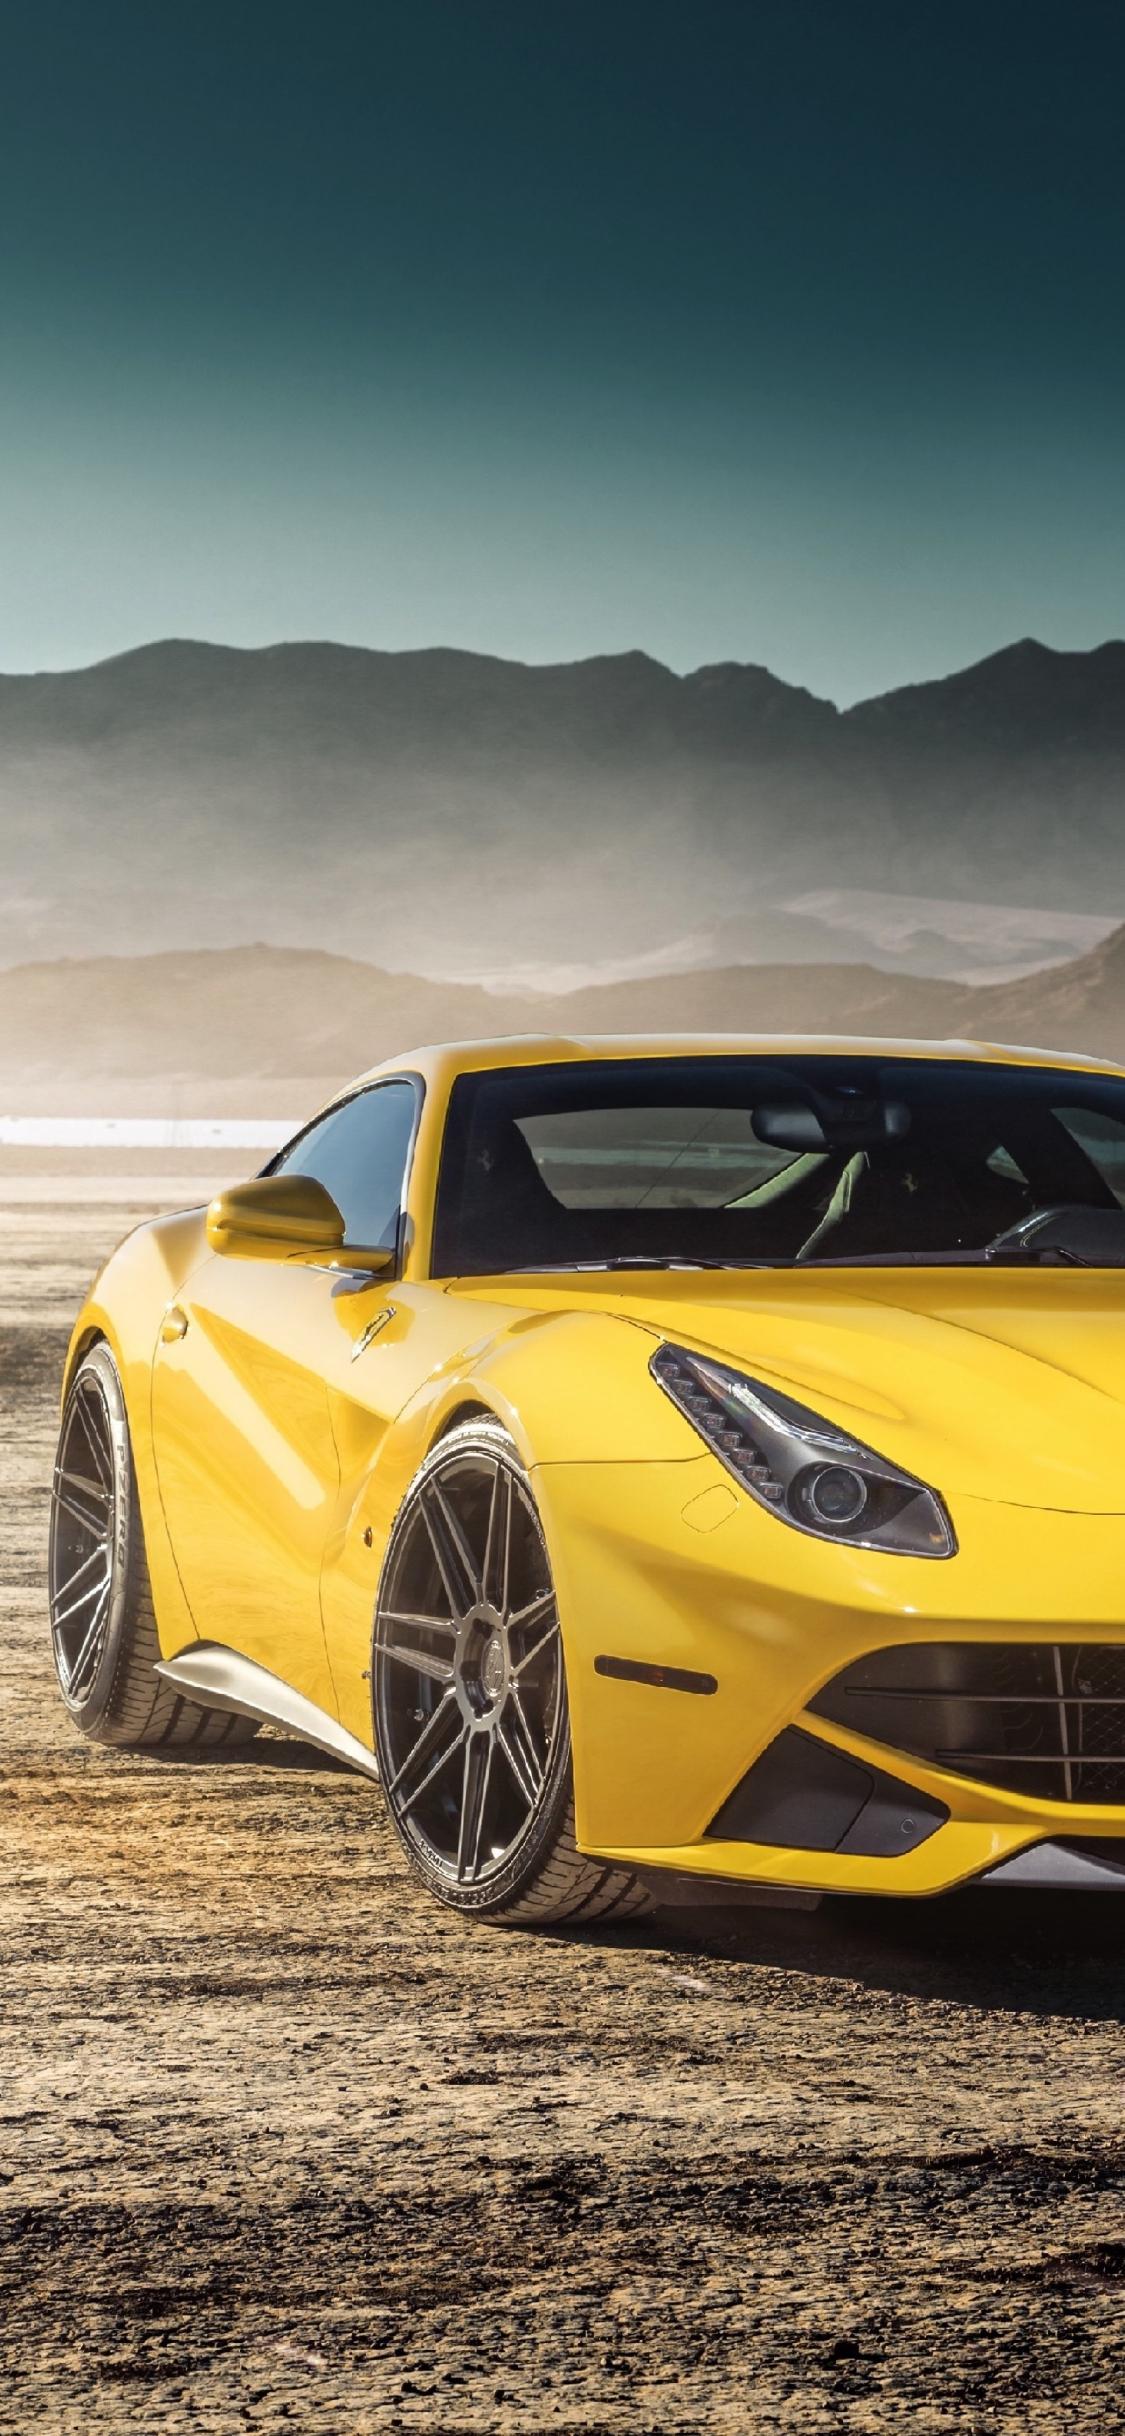 Download 1125x2436 Wallpaper Luxurious Sports Car Ferrari